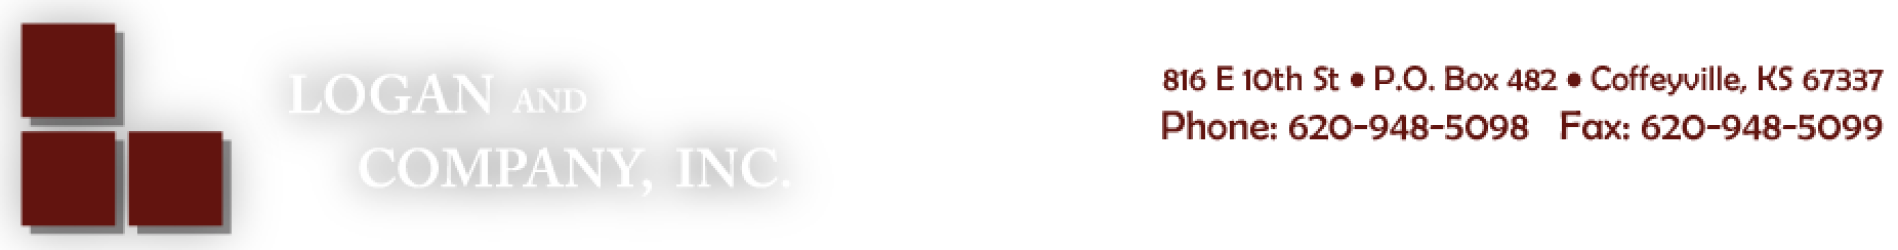 Logan & Company Inc logo